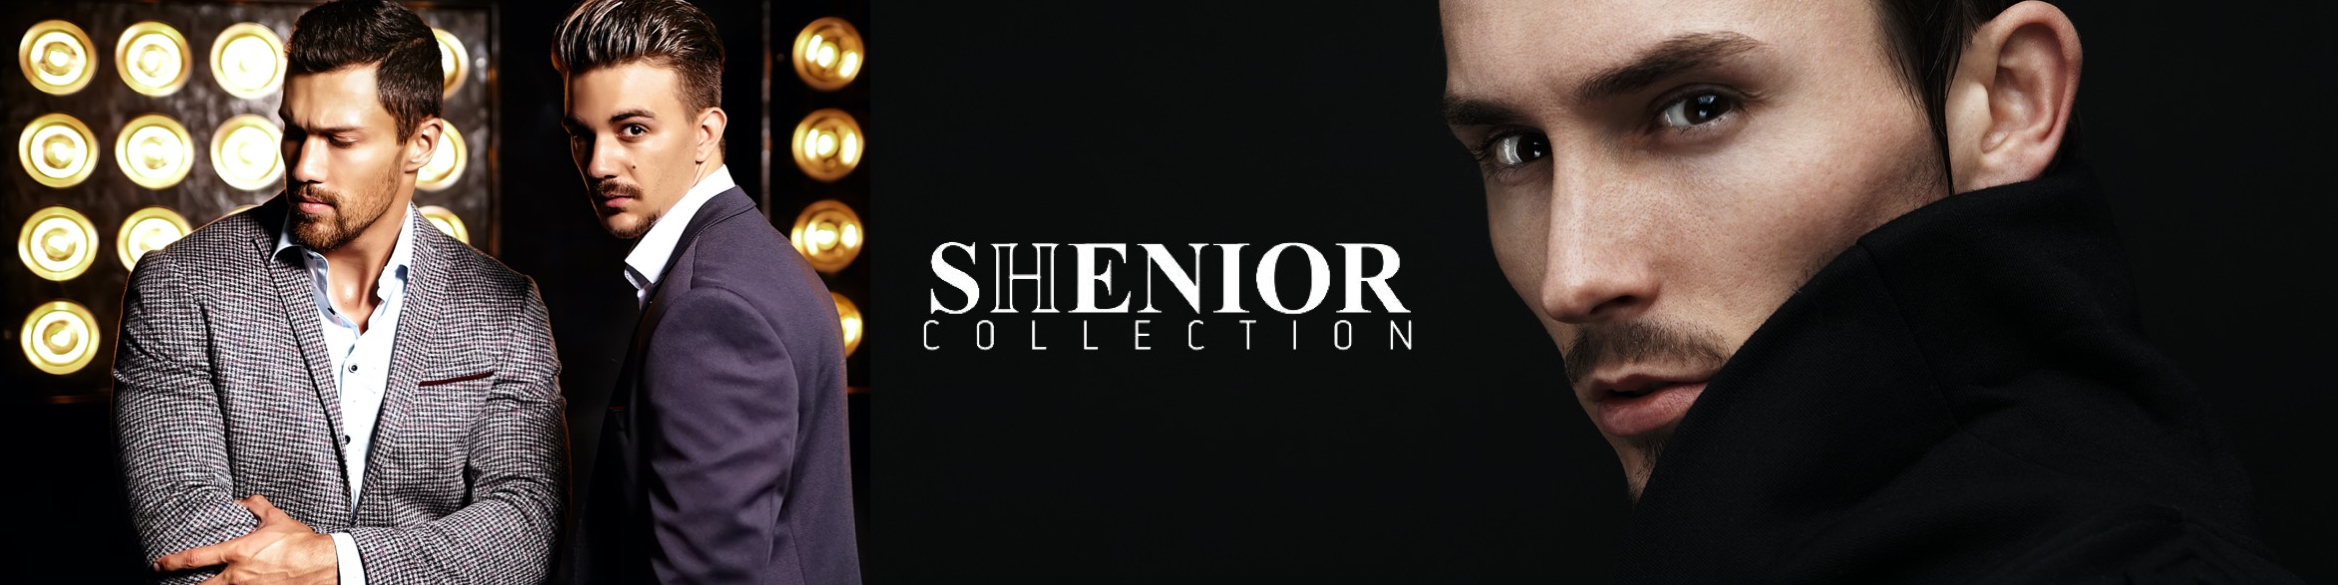 Shenior